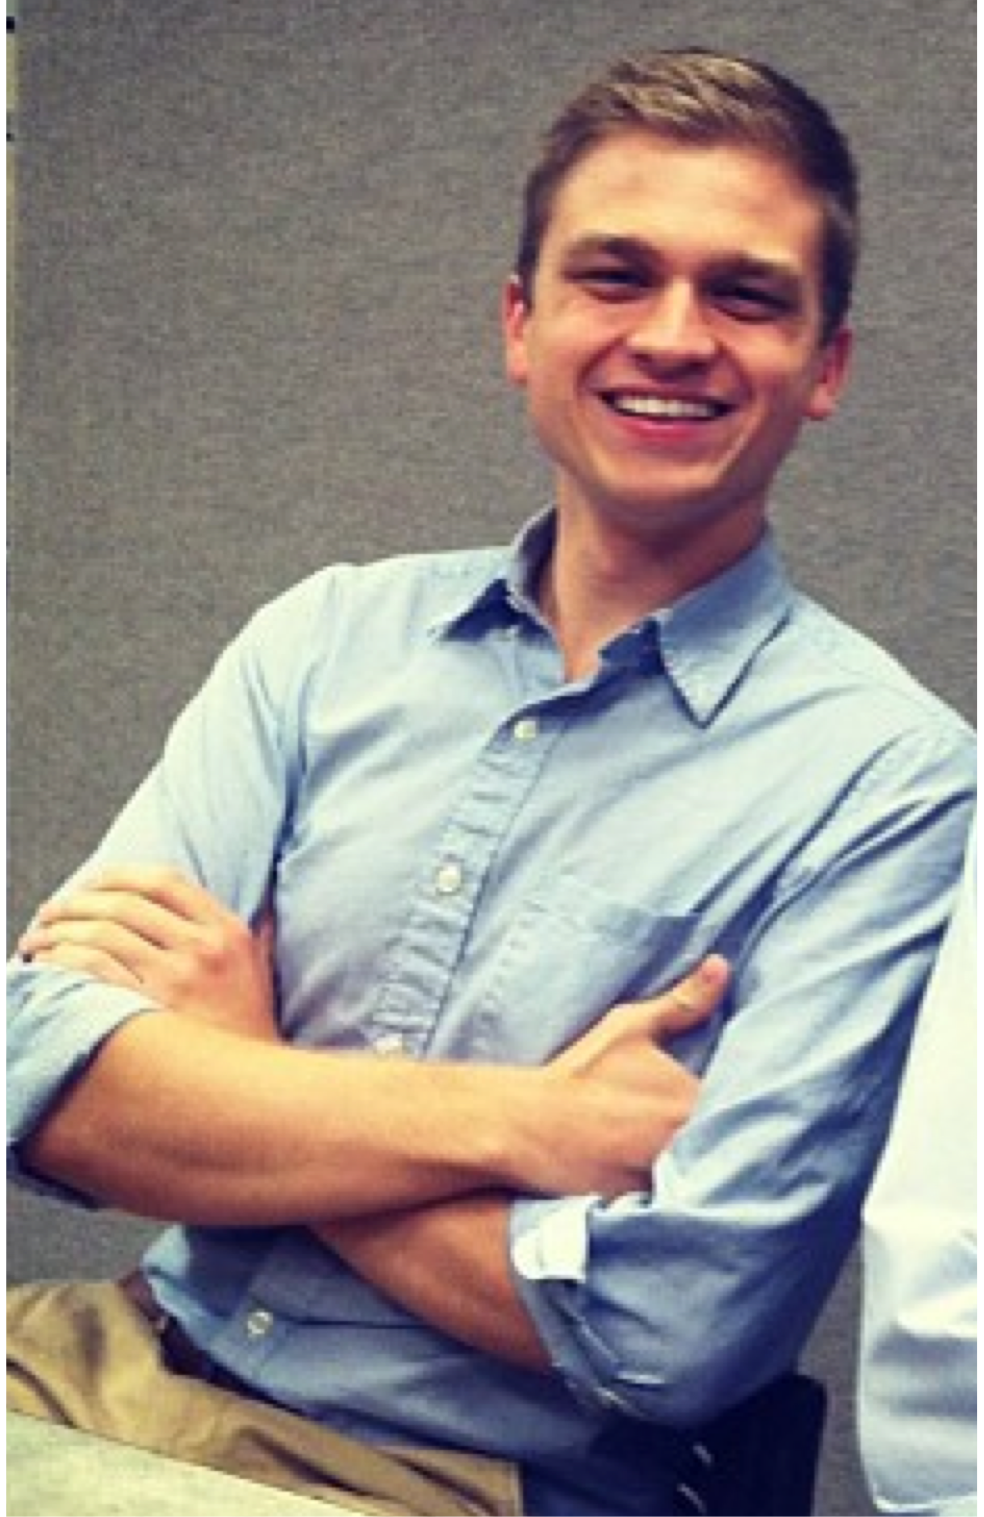 Dan Fernelius Based in Minneapolis, Minnesota